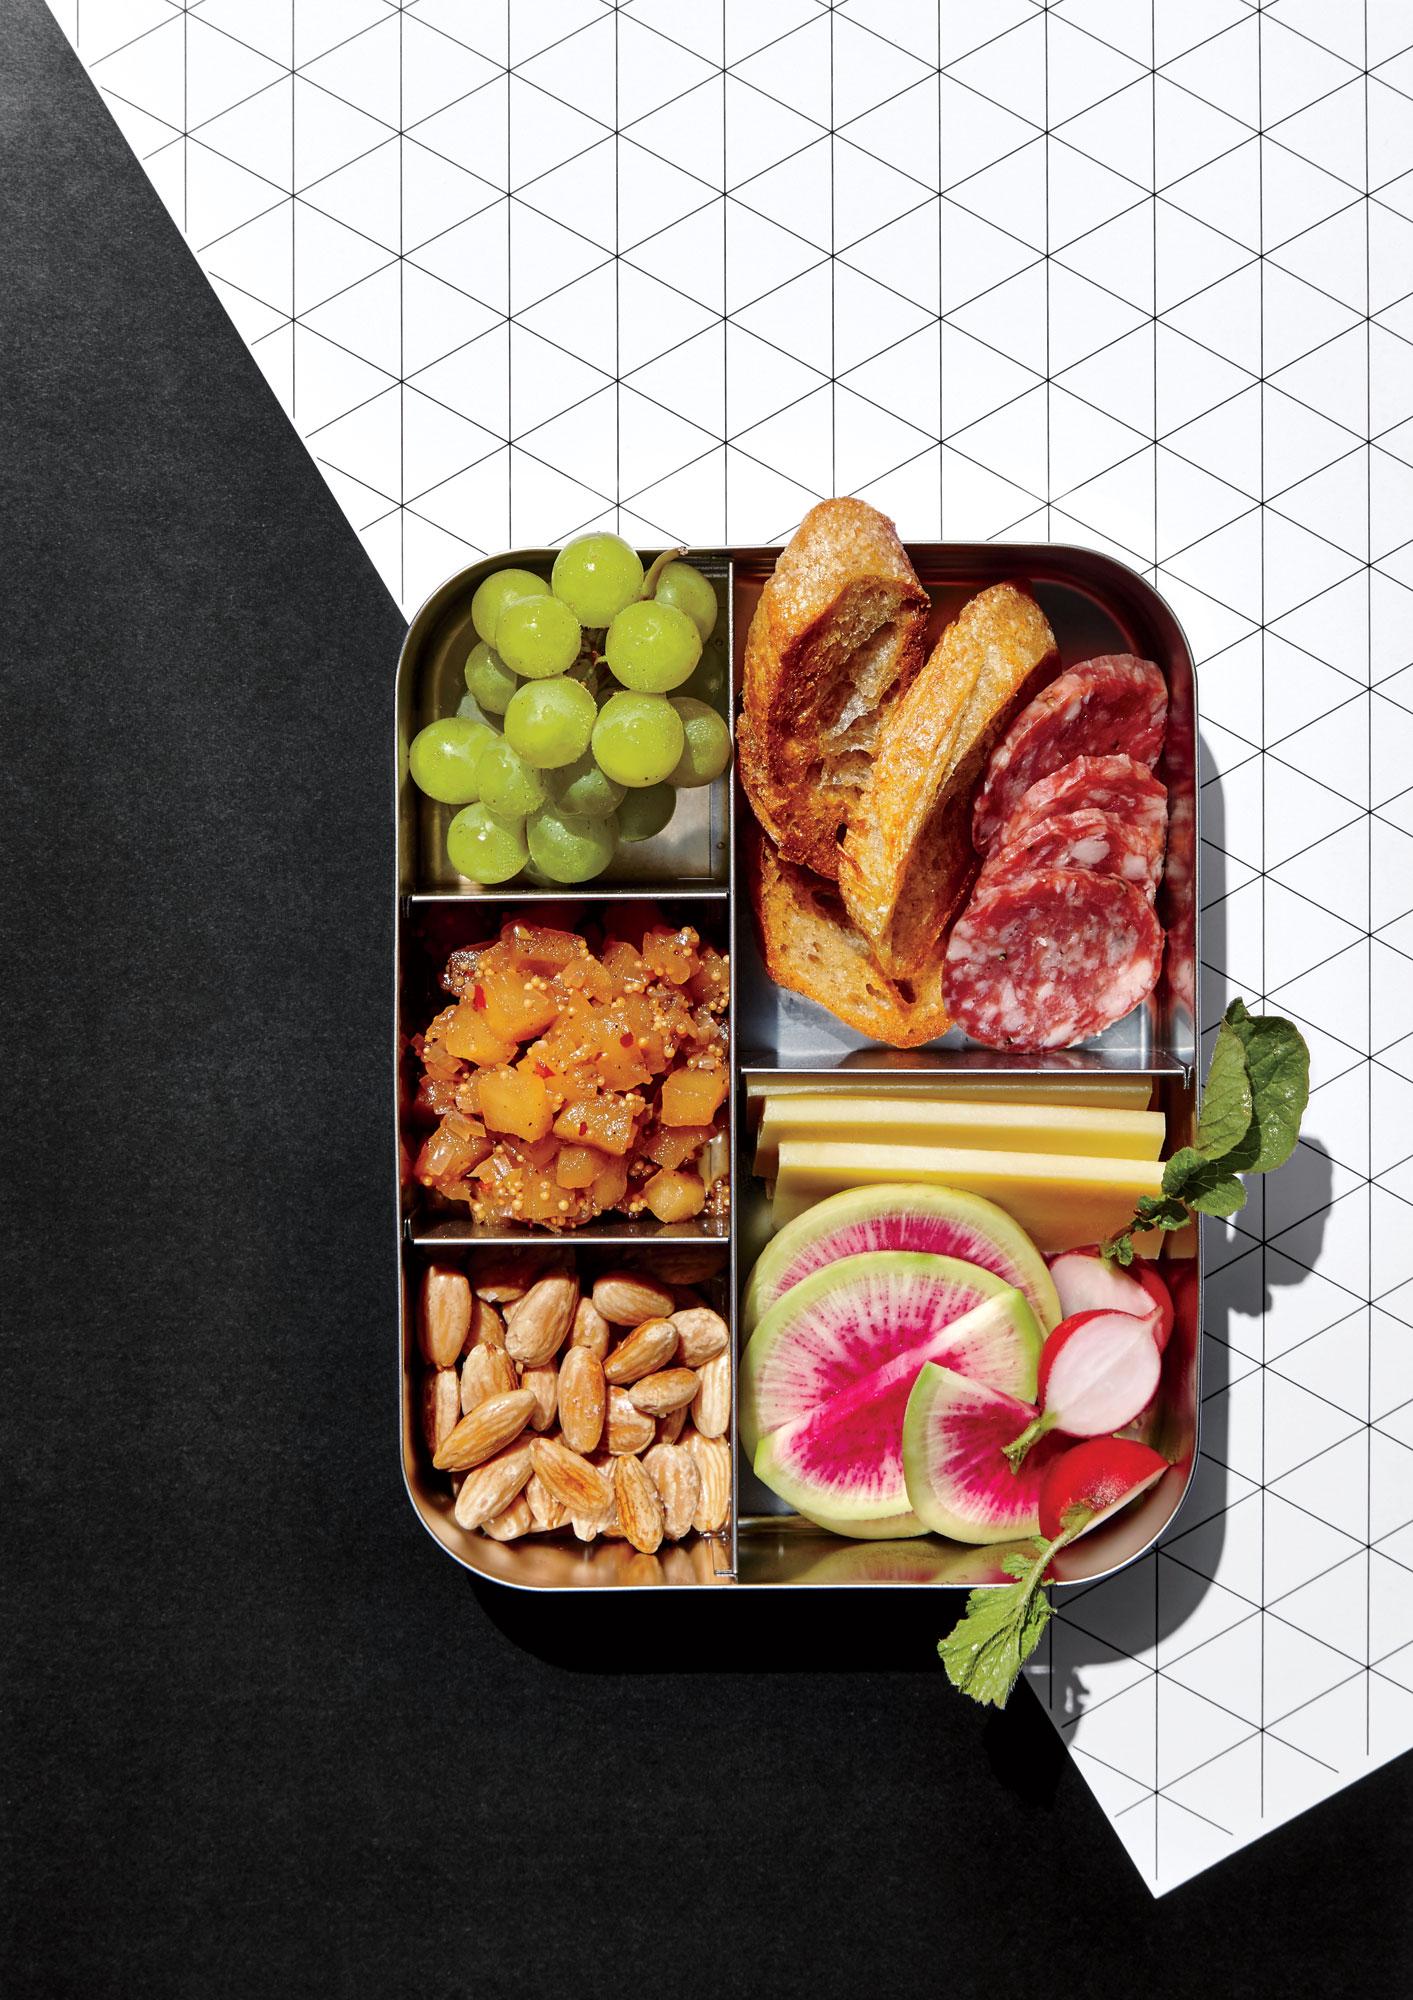 Ploughman's Lunch Box